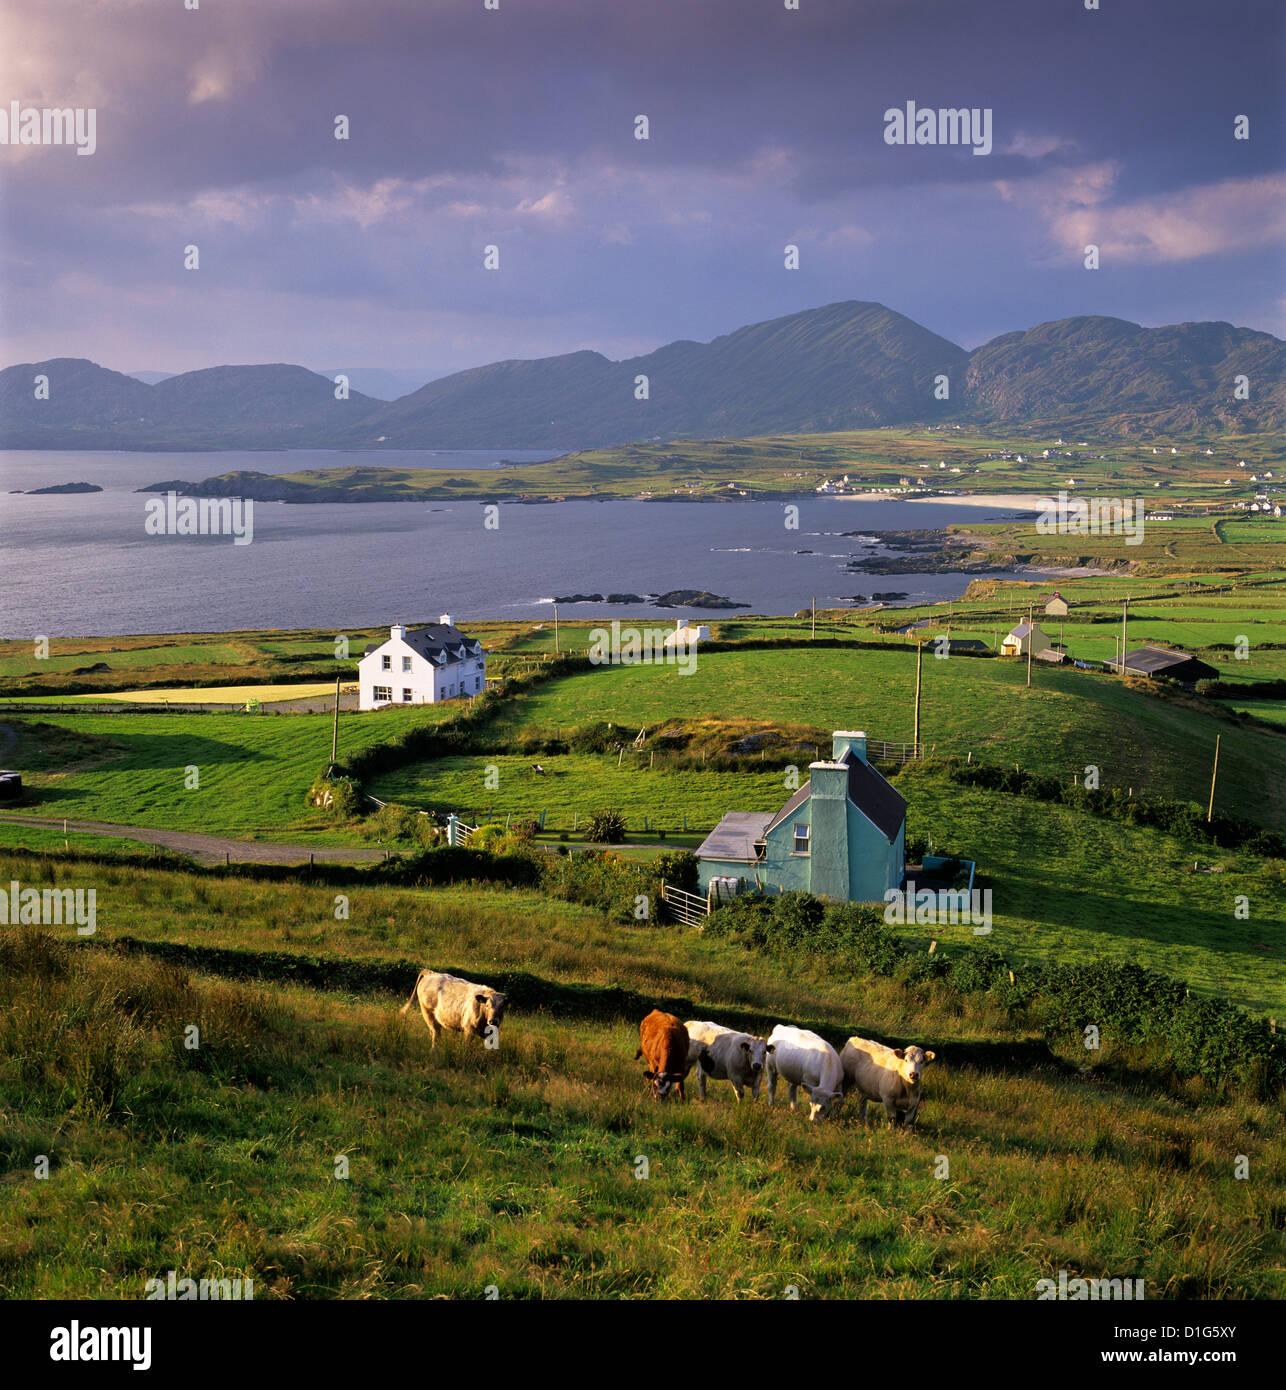 View over Allihies and Ballydonegan Bay, Beara Peninsula, County Cork, Munster, Republic of  Ireland, Europe - Stock Image